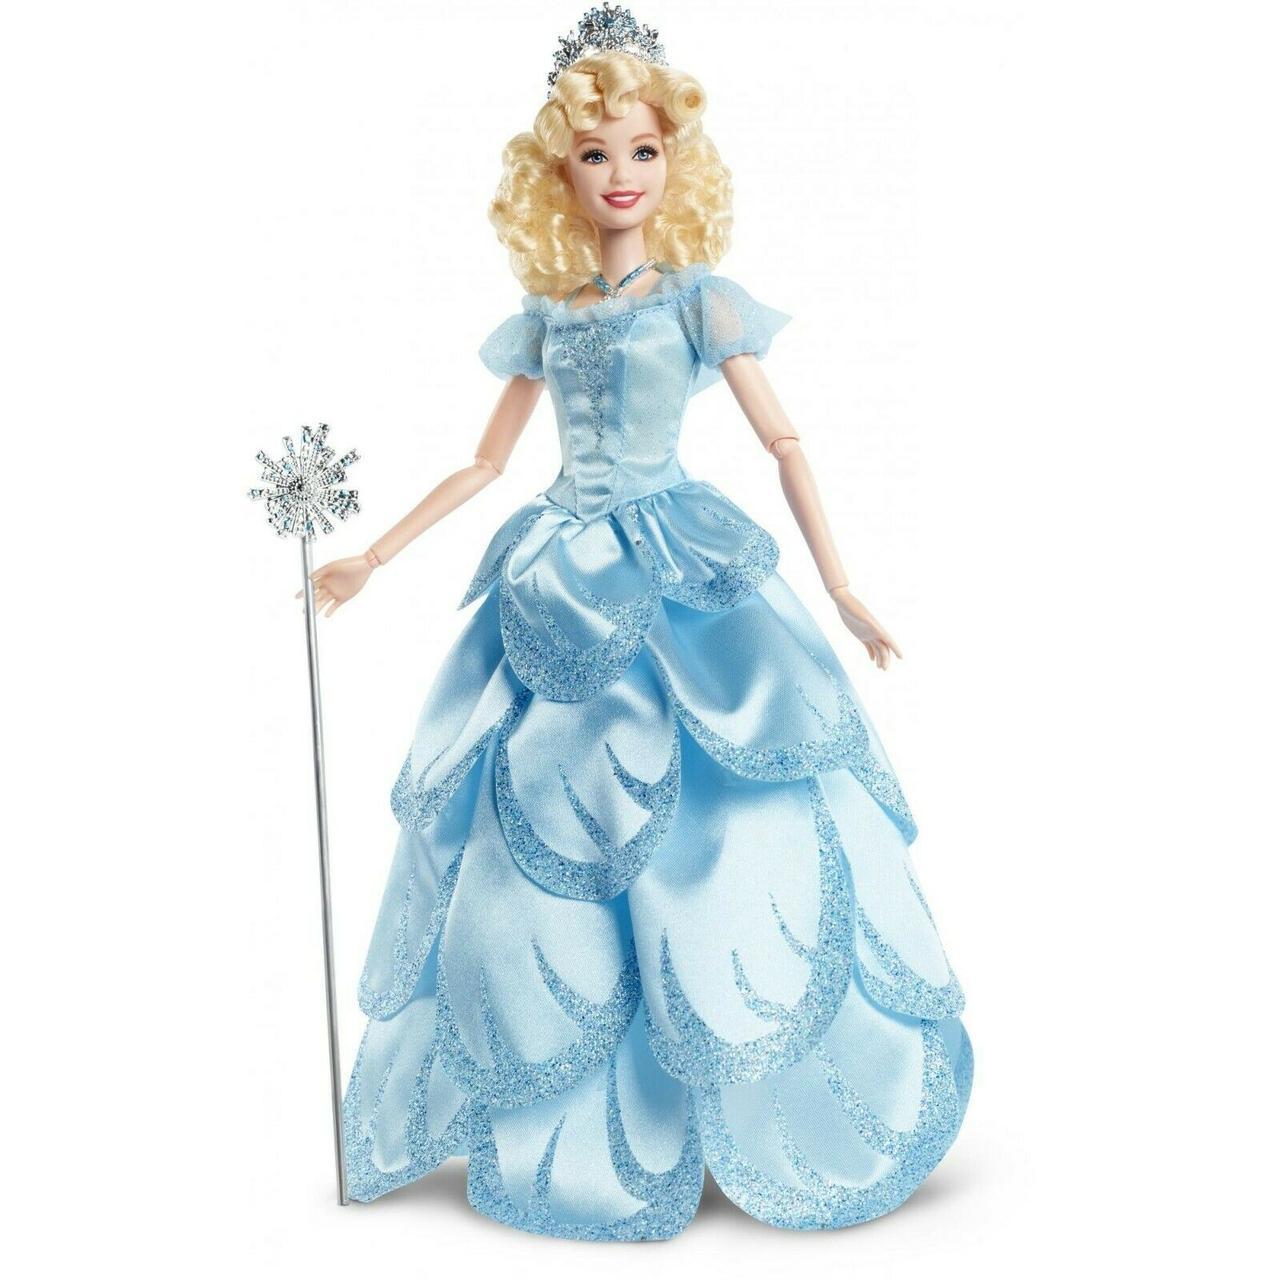 Barbie Коллекционная шарнирная кукла Барби Глинди (Barbie FJH61 Wicked Glinda Doll)